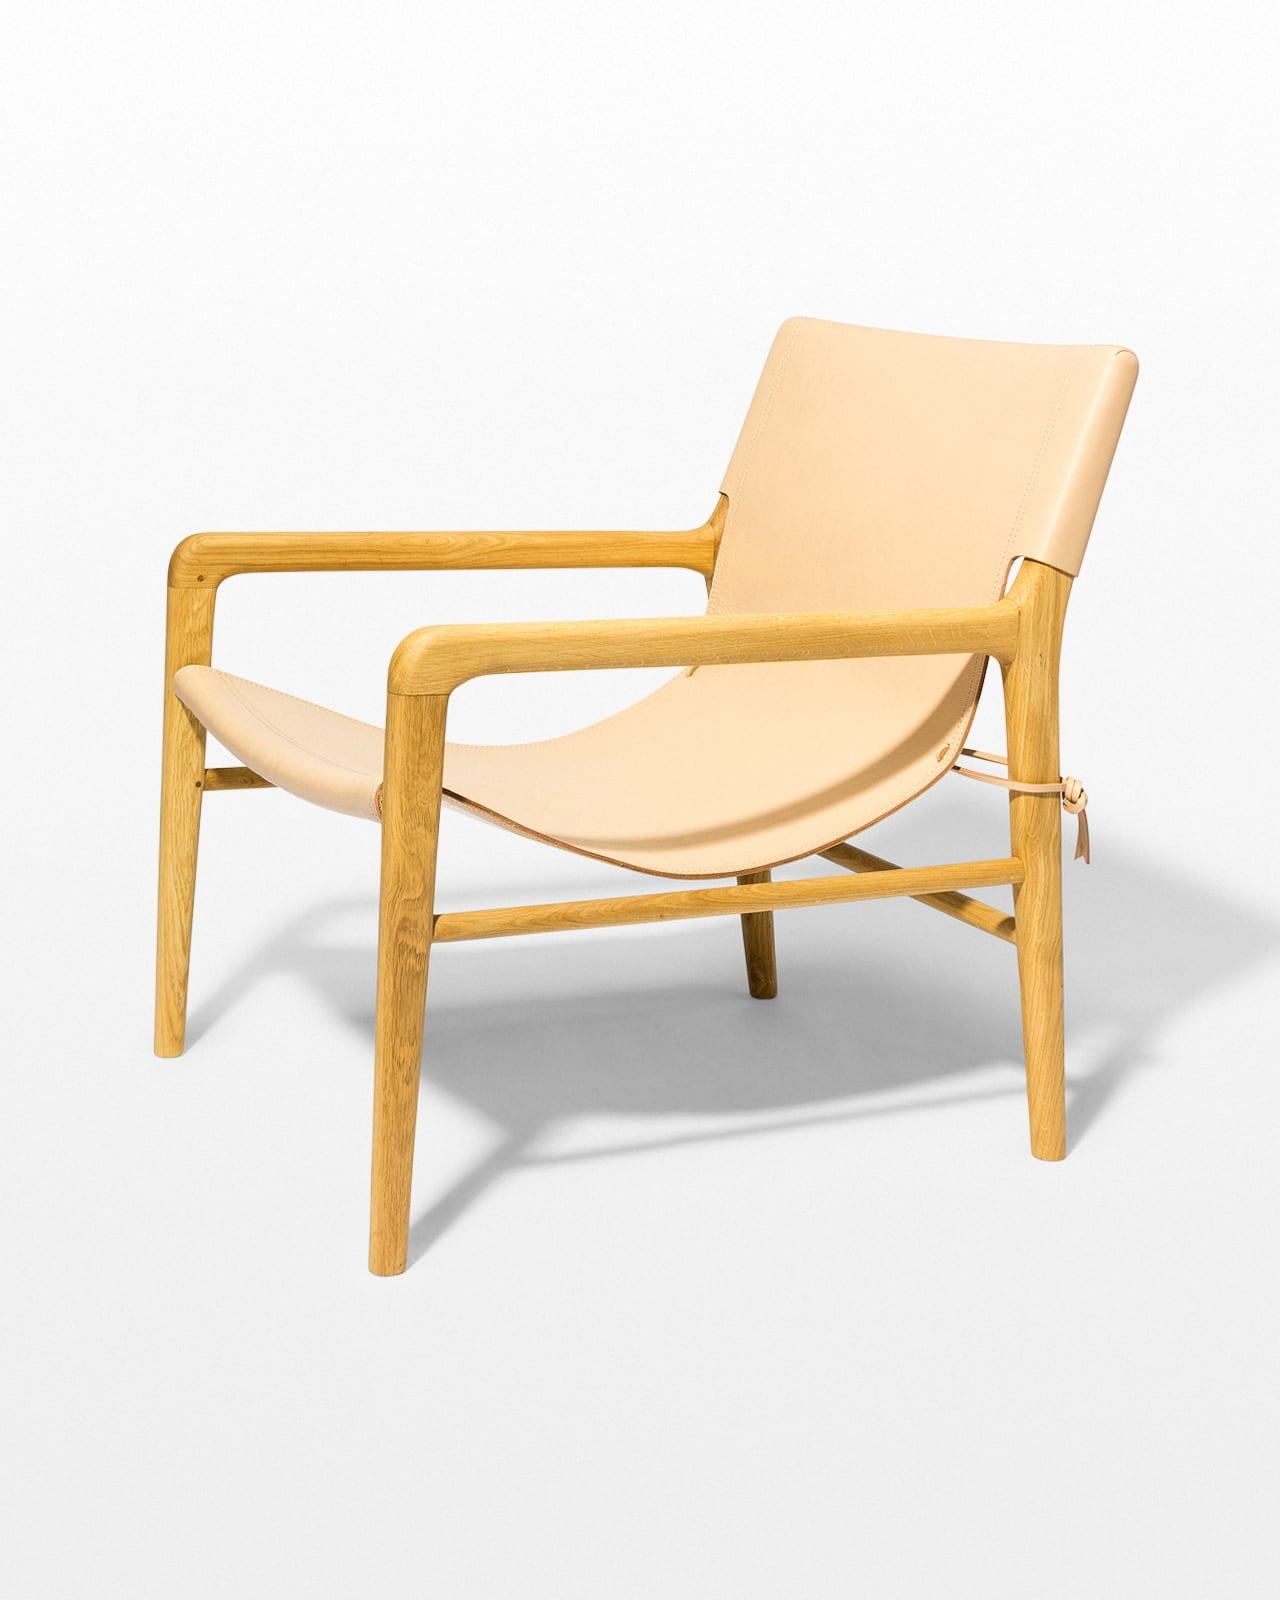 Miraculous Ch601 Cad Blush Leather Sling Safari Chair Prop Rental Cjindustries Chair Design For Home Cjindustriesco